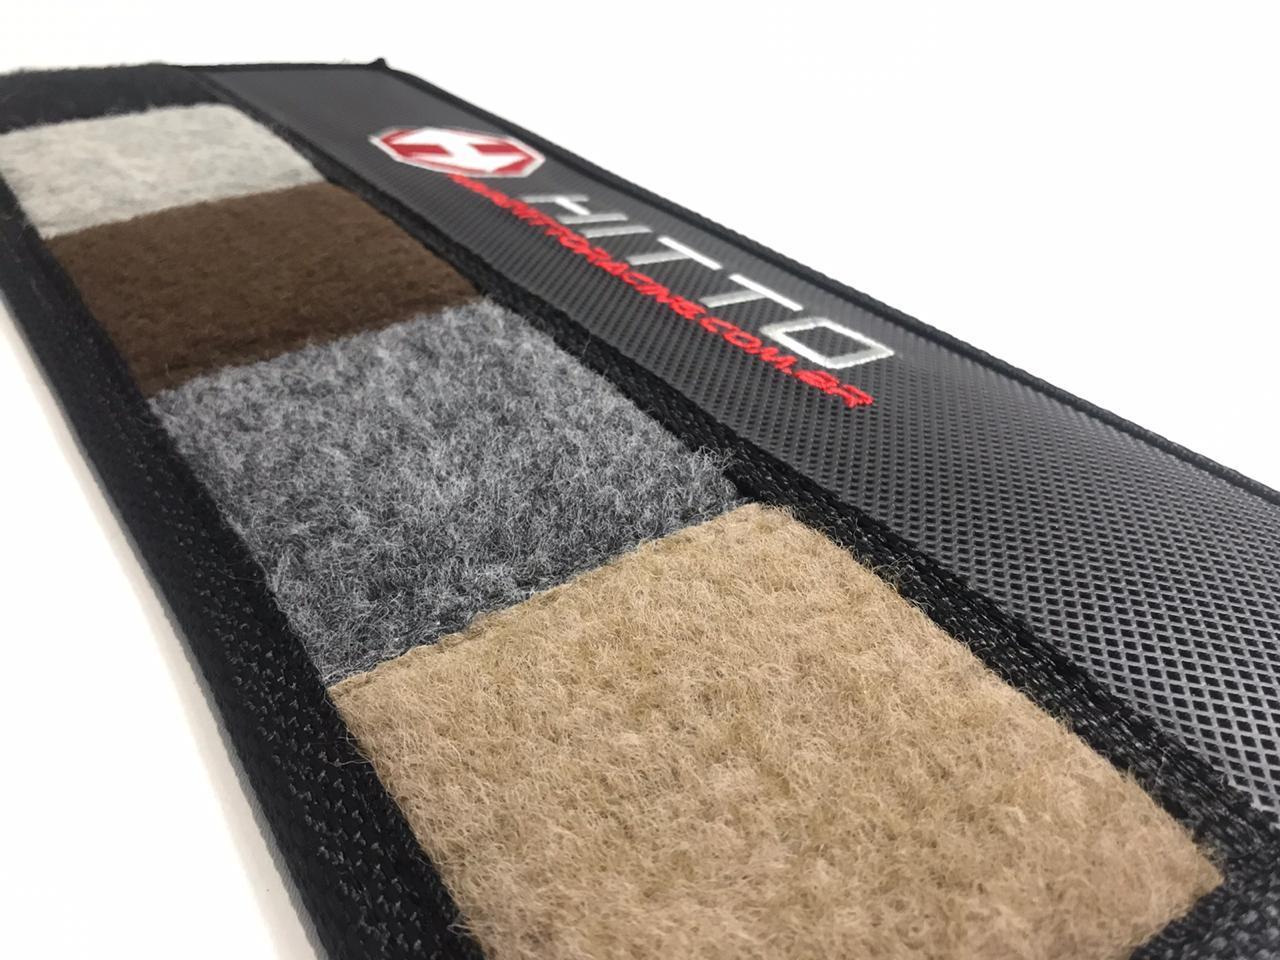 Tapete Audi A4 2011/12 Carpete Luxo Base Borracha Pinada